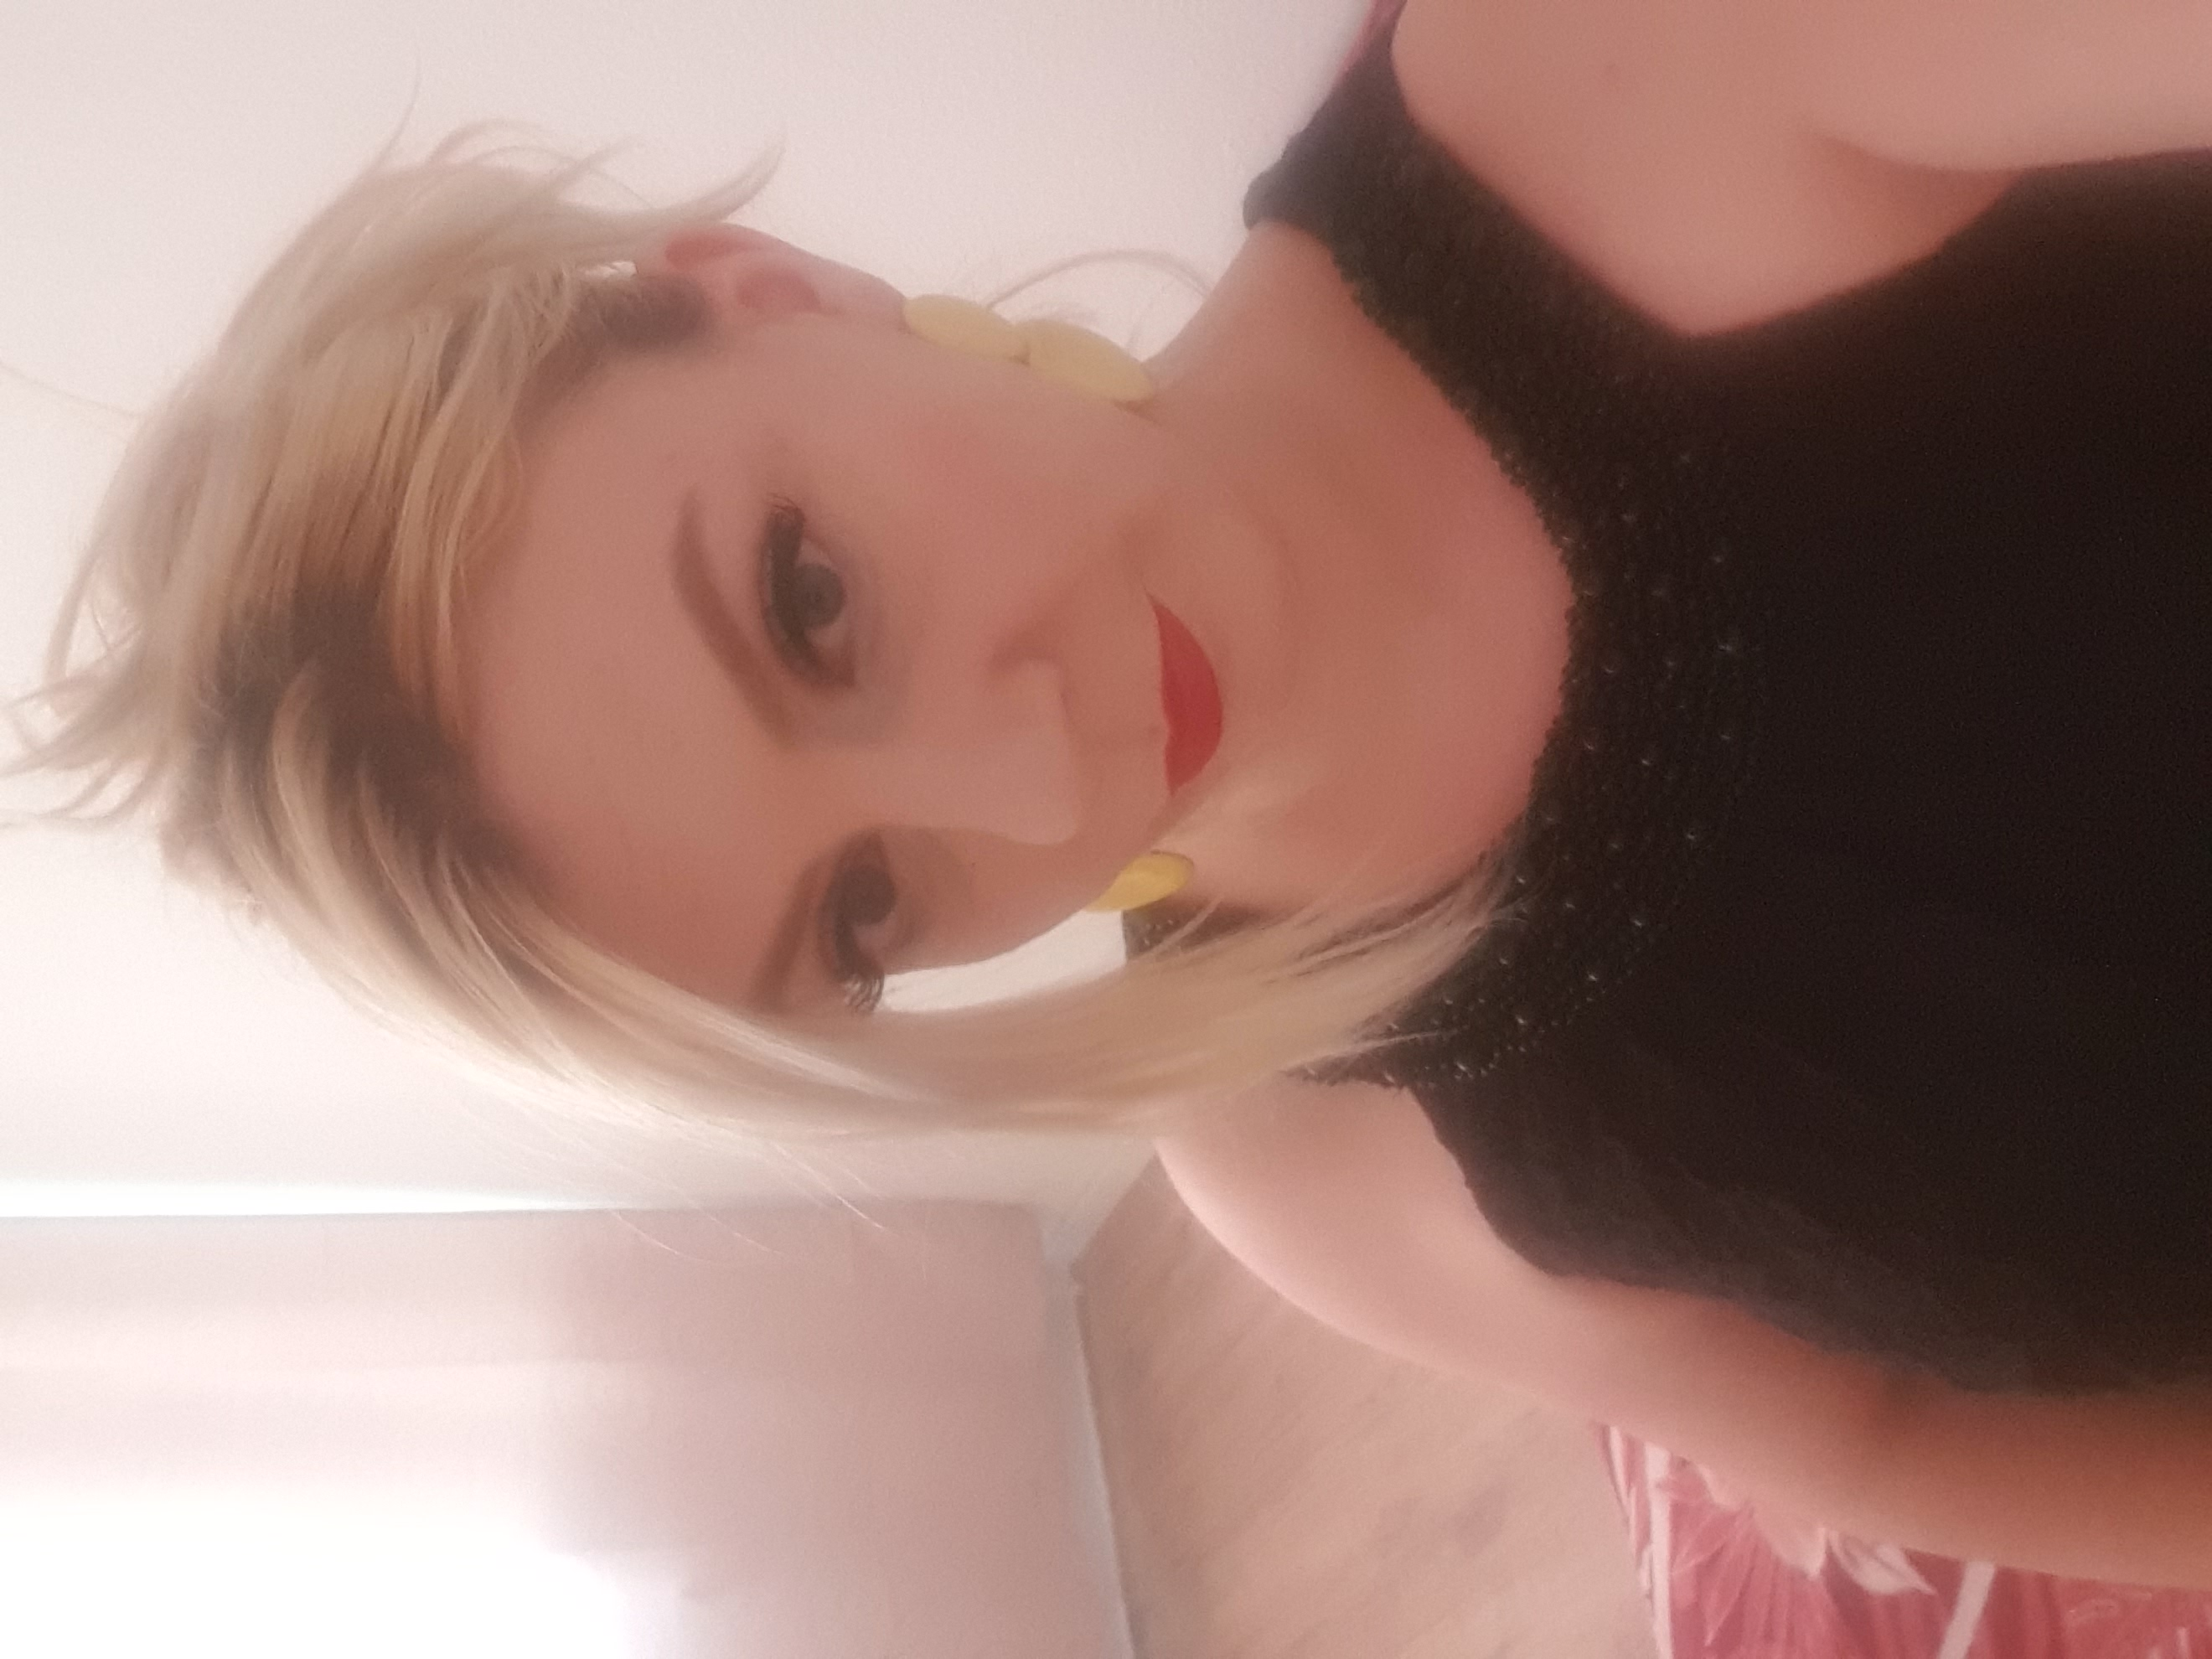 Model Anamaria aus Berlin Haarfarbe: blond (hell)